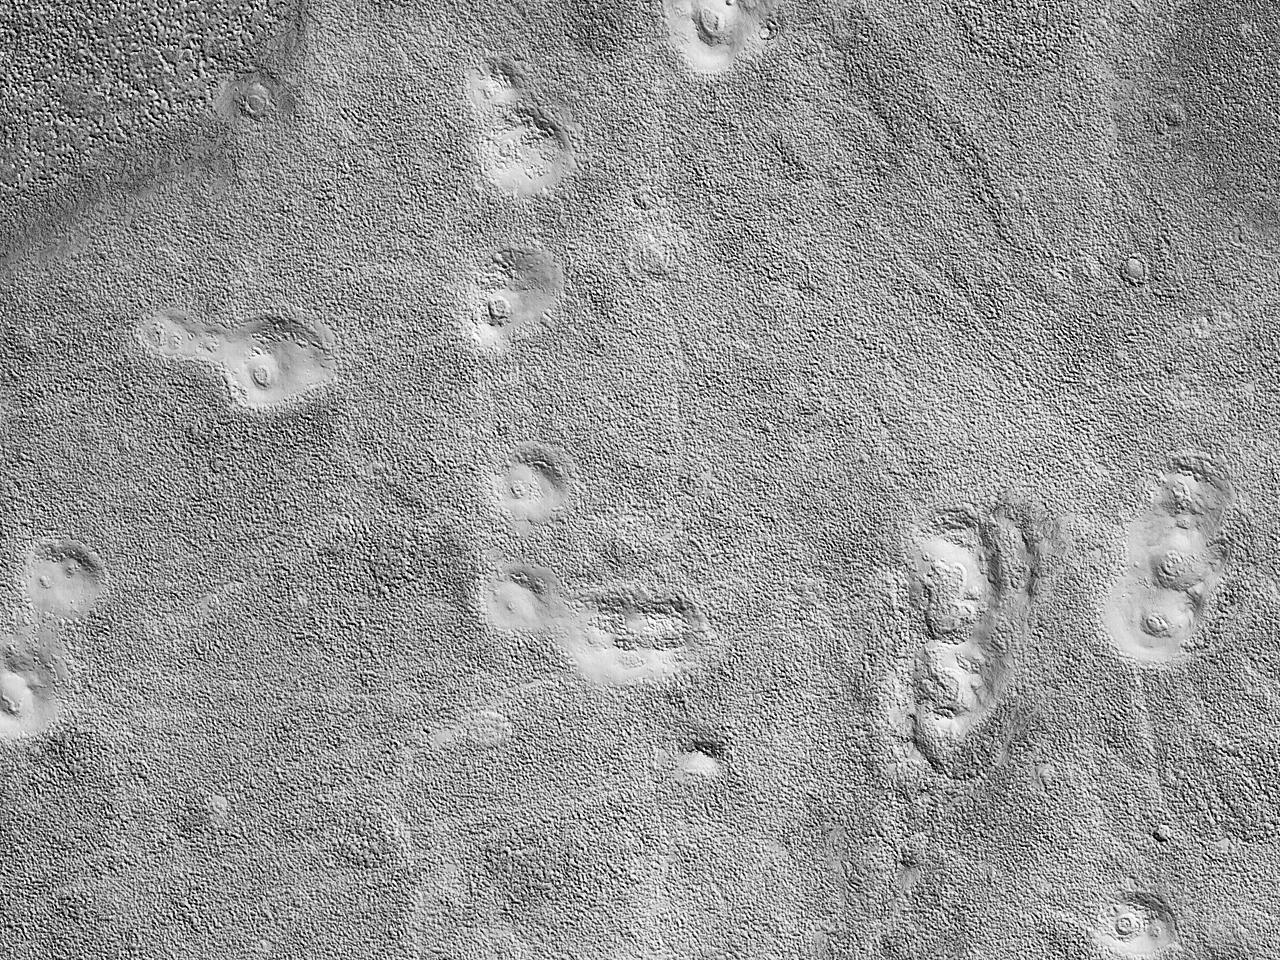 Landformer i Utopia Planitia